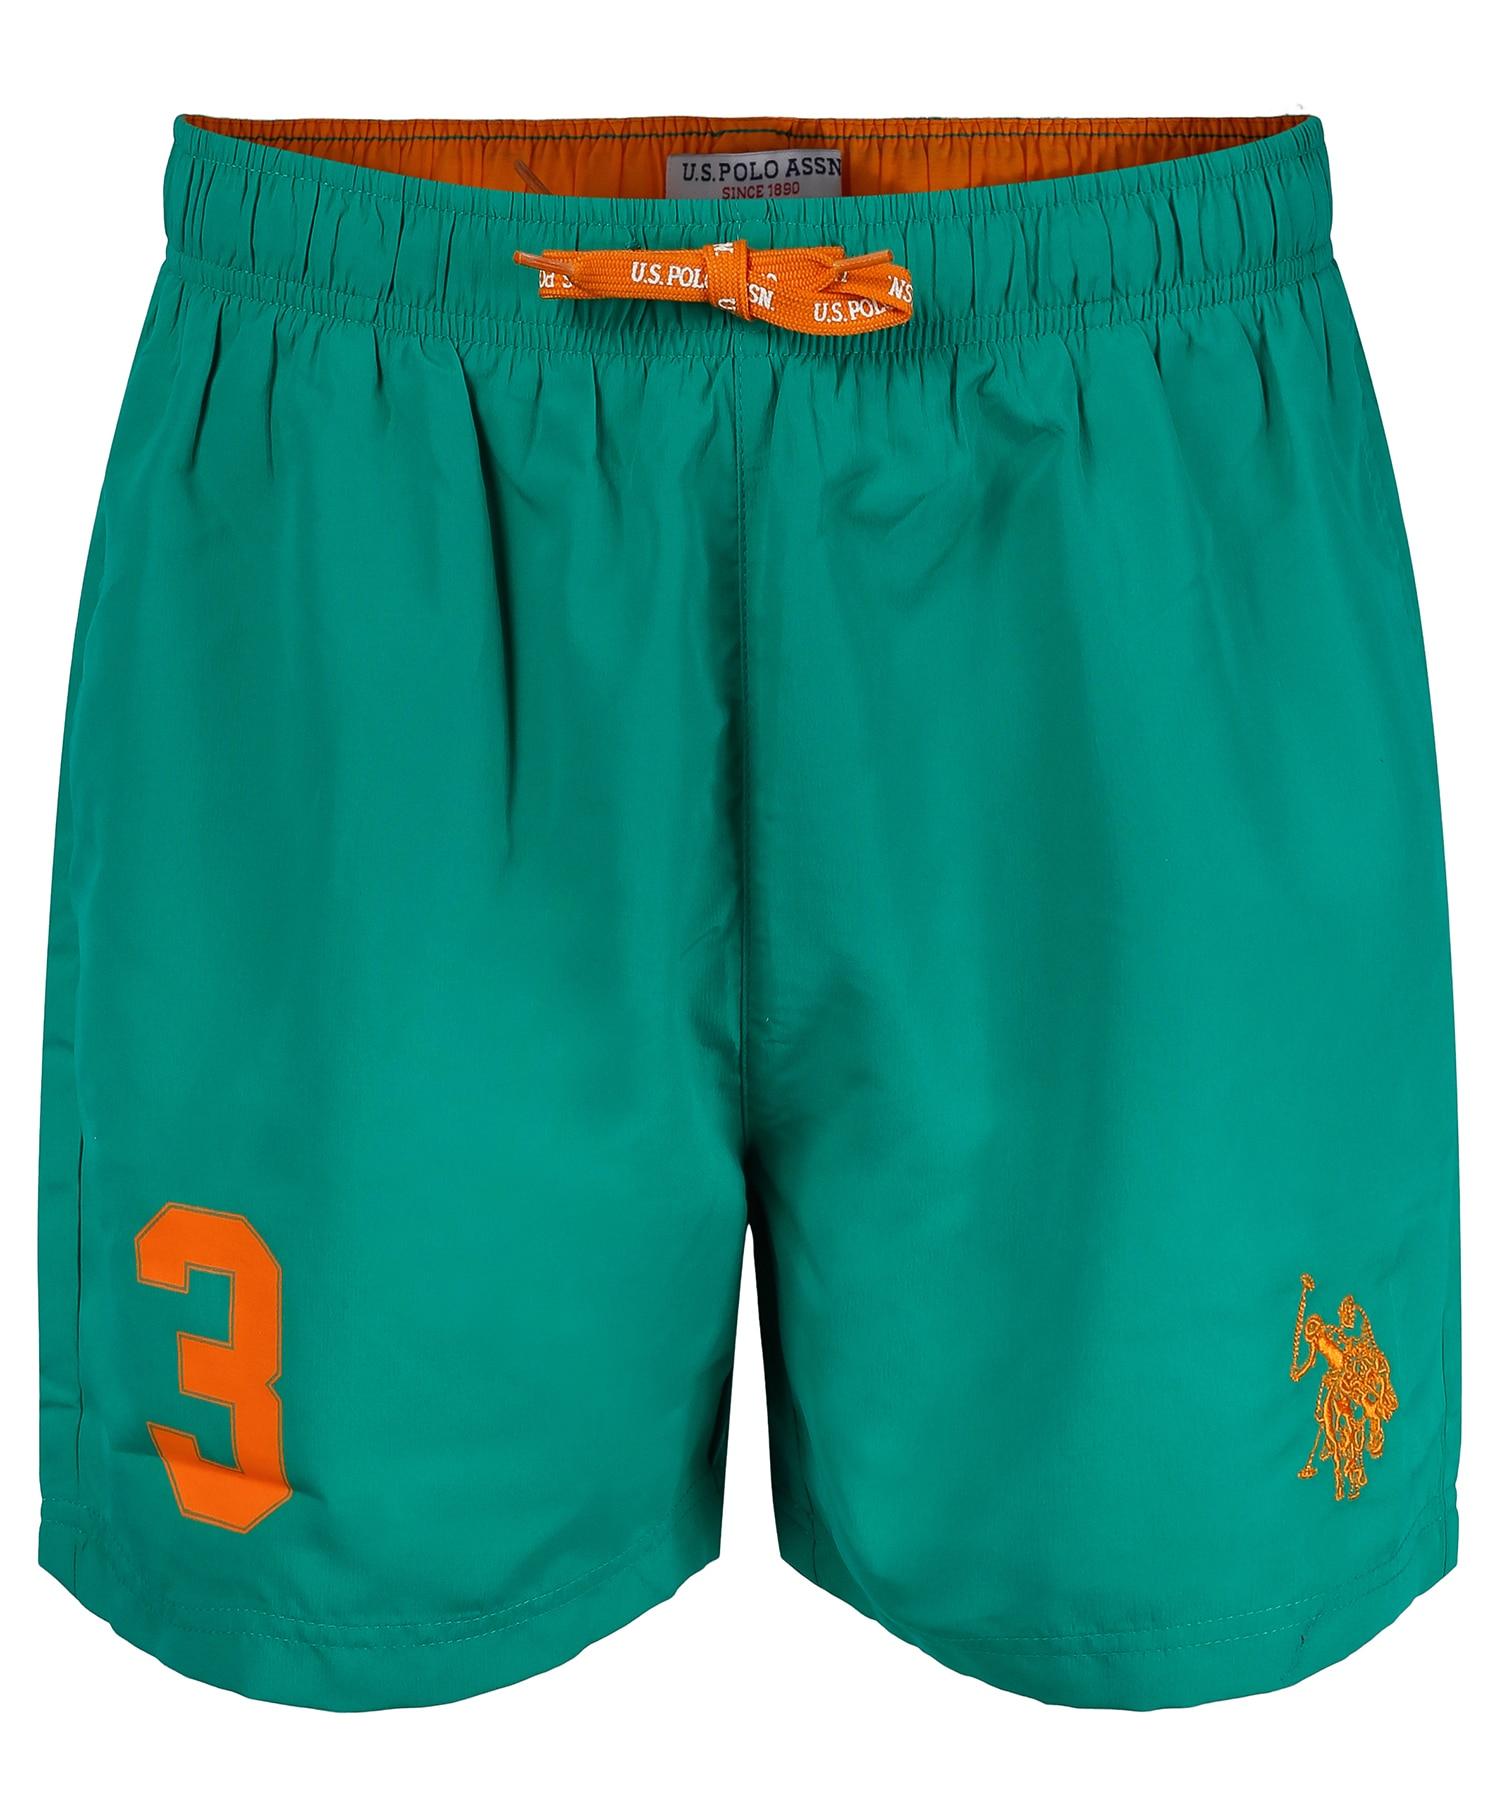 U.S.Polo Alexander shorts